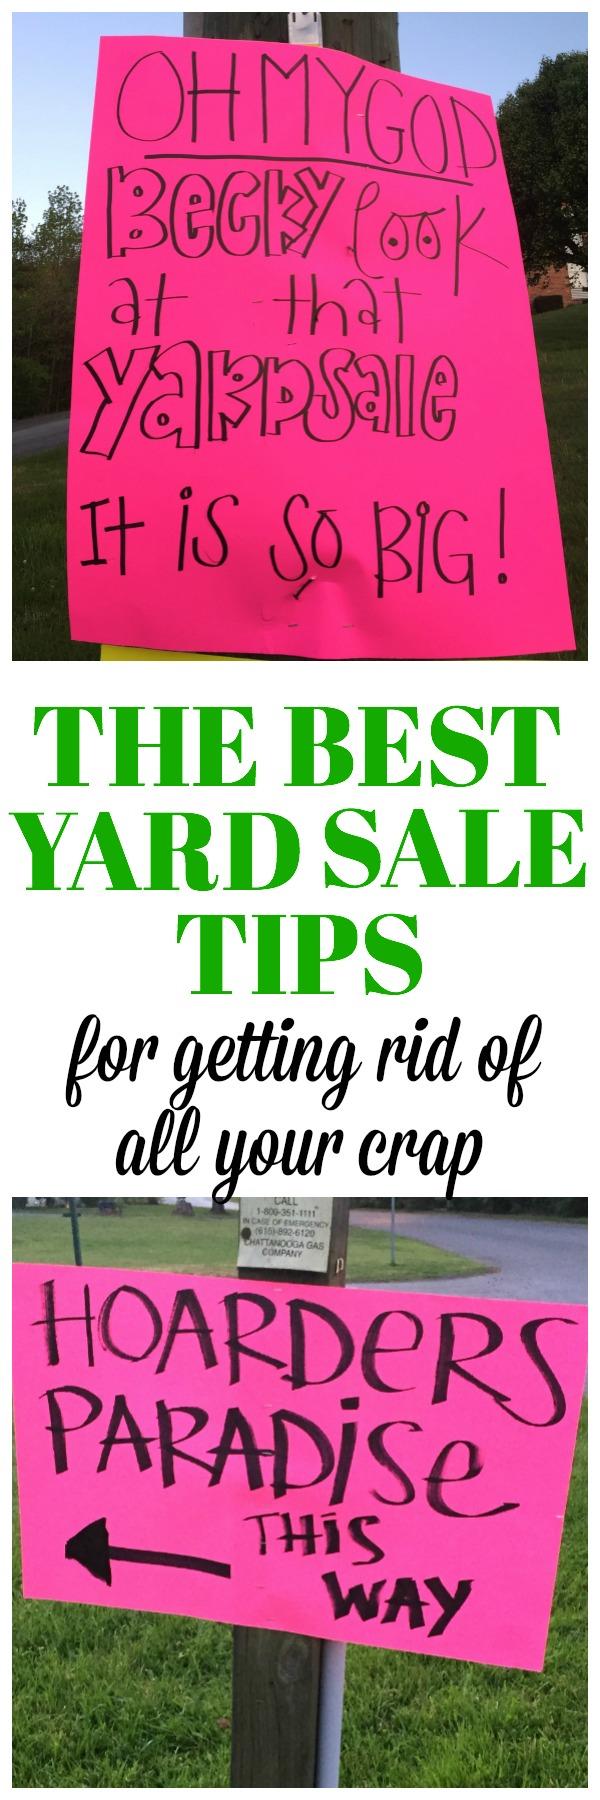 The Best Yard Sale Tips | Yard Sale Ideas | Best Yard Sale Signs | Yard Sale Pricing | Garage Sale Tips | Garage Sale Ideas